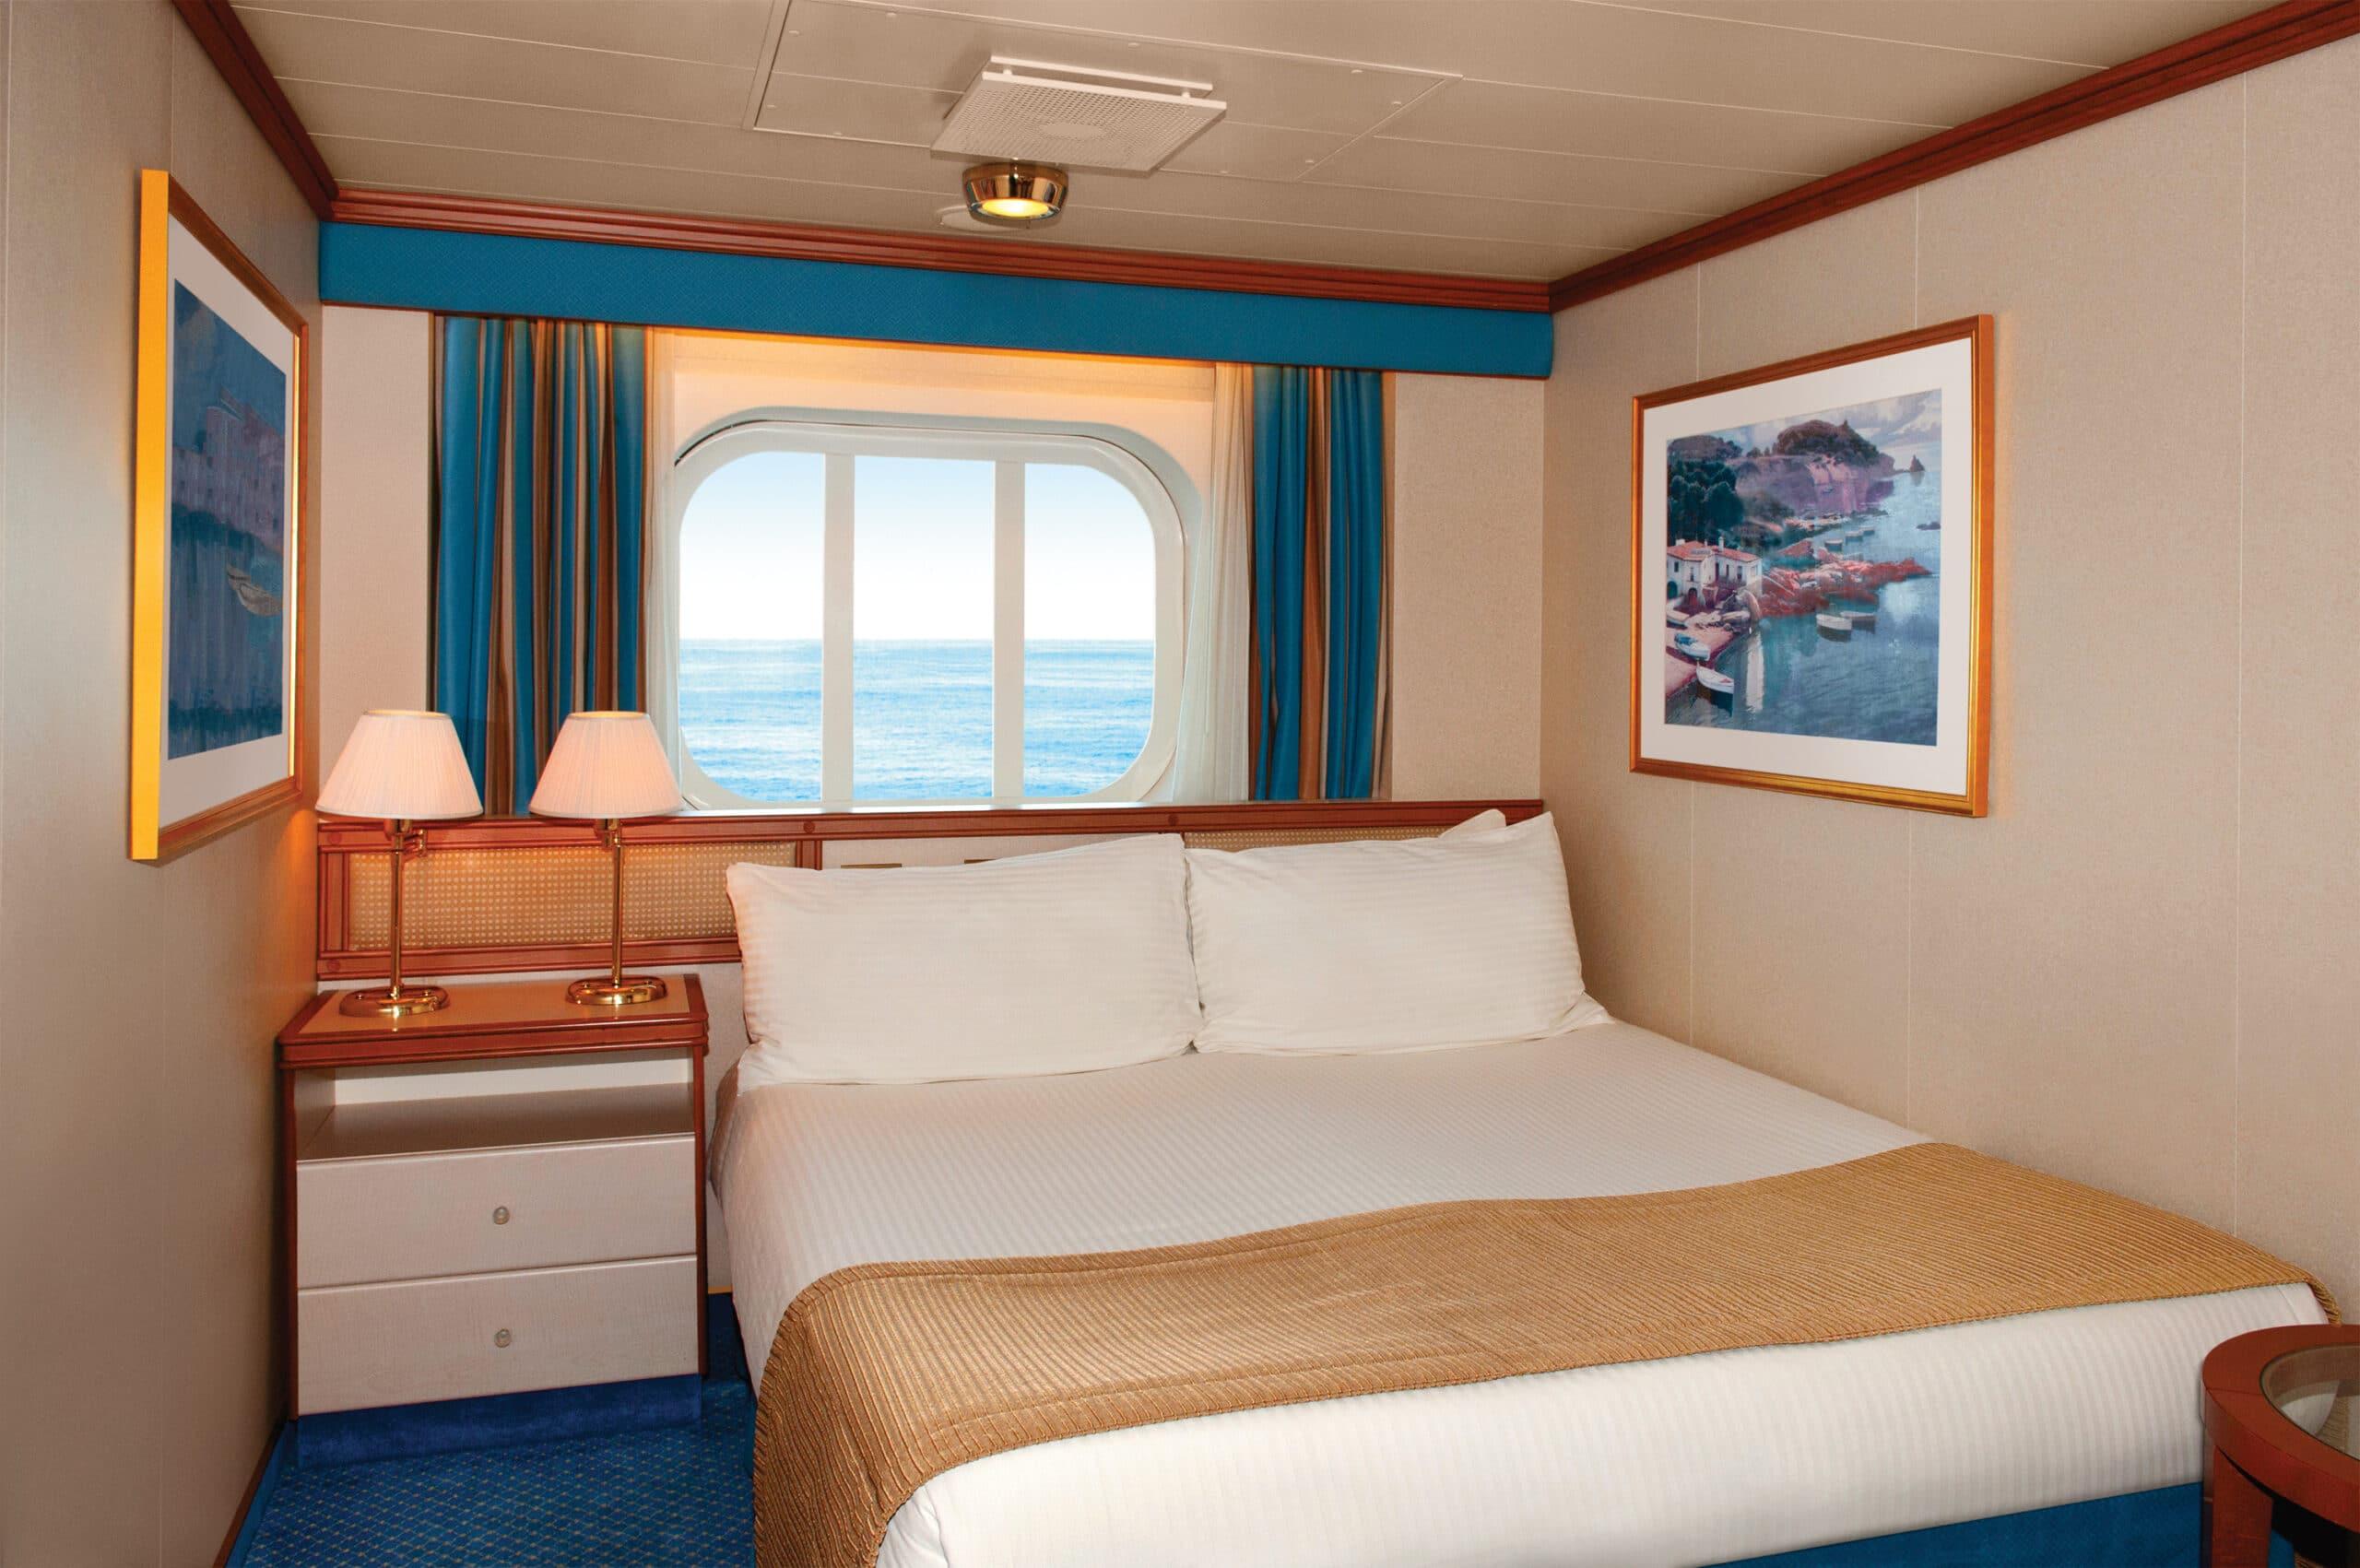 Princess-cruises-Crown-princess-schip-cruiseschip-categorie OB-OC-OE-OF-buitenhut